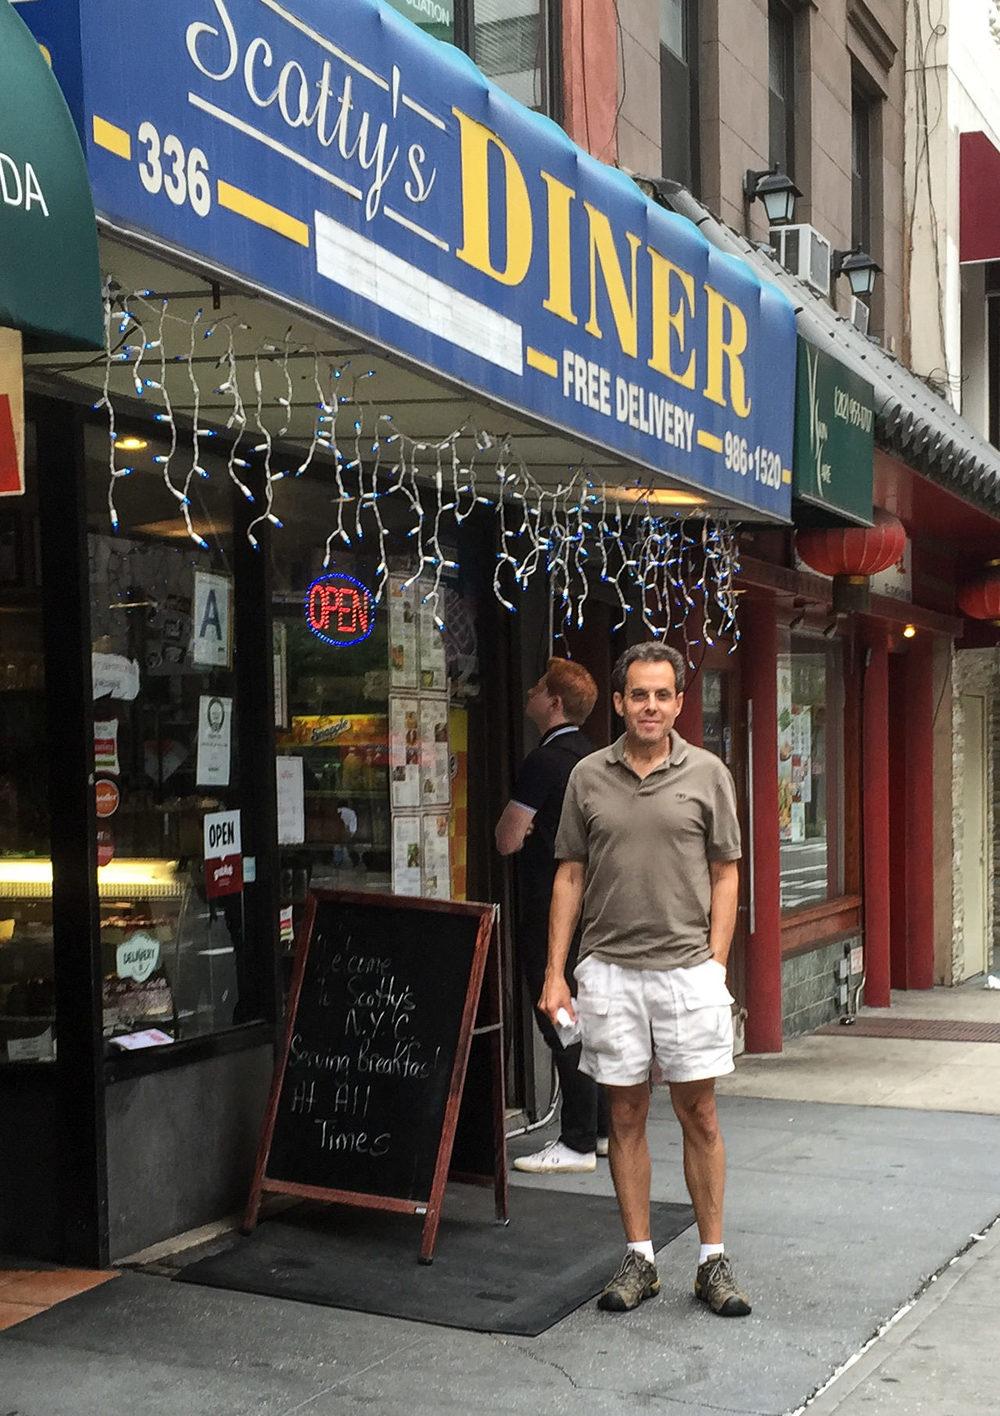 Scotty's Diner